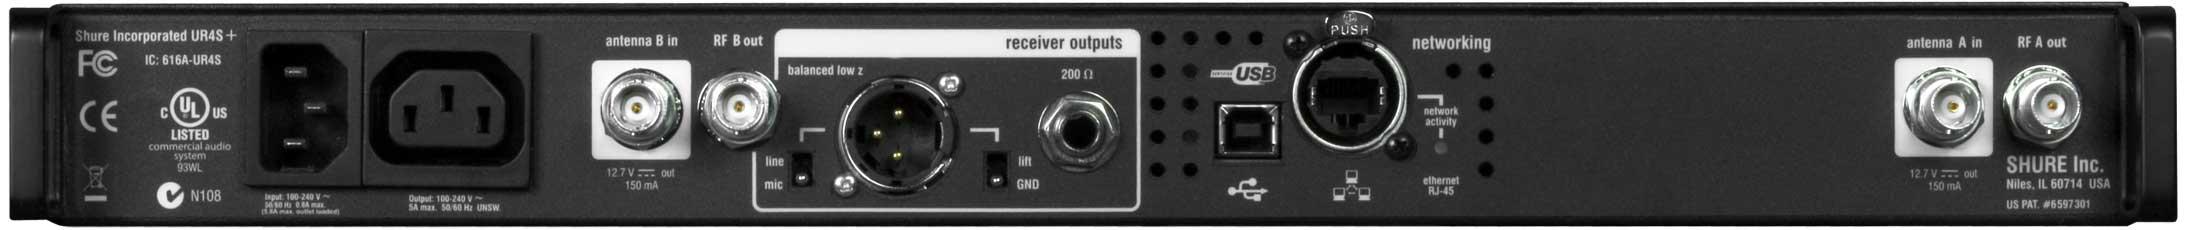 Single UHF-R Receiver H4 (518-578)